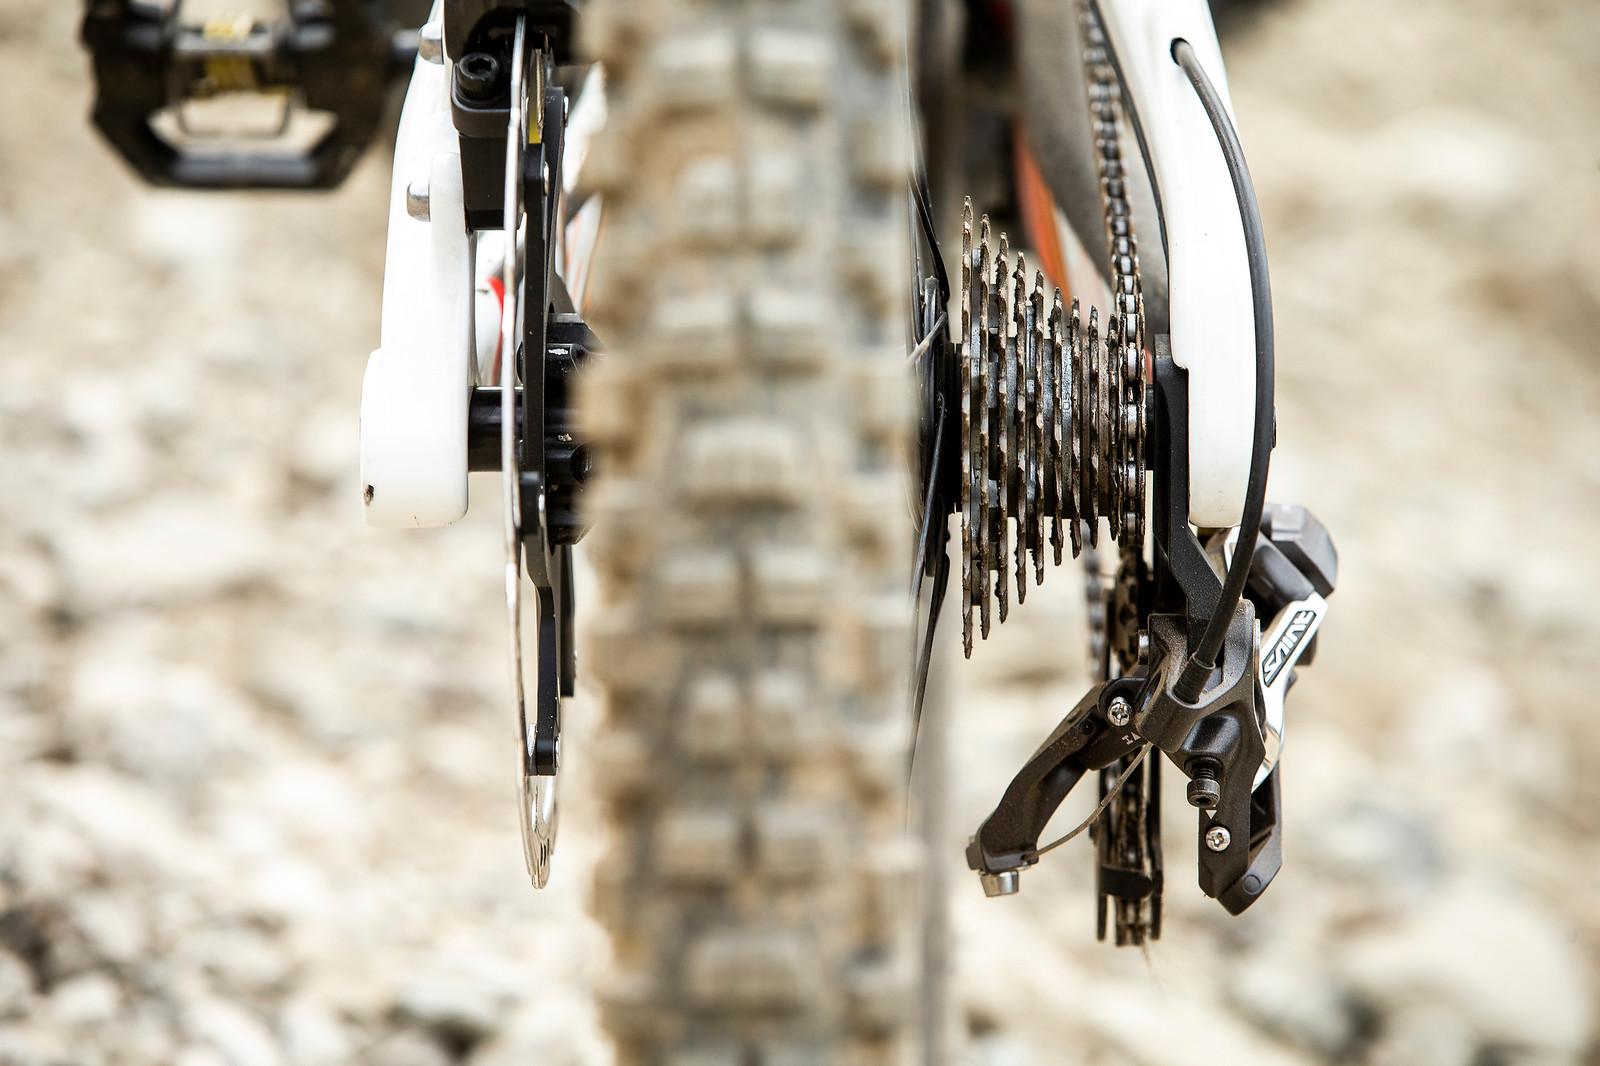 10-speed Shimano Road Cluster - WINNING BIKE - Danny Hart's Saracen Myst - Mountain Biking Pictures - Vital MTB